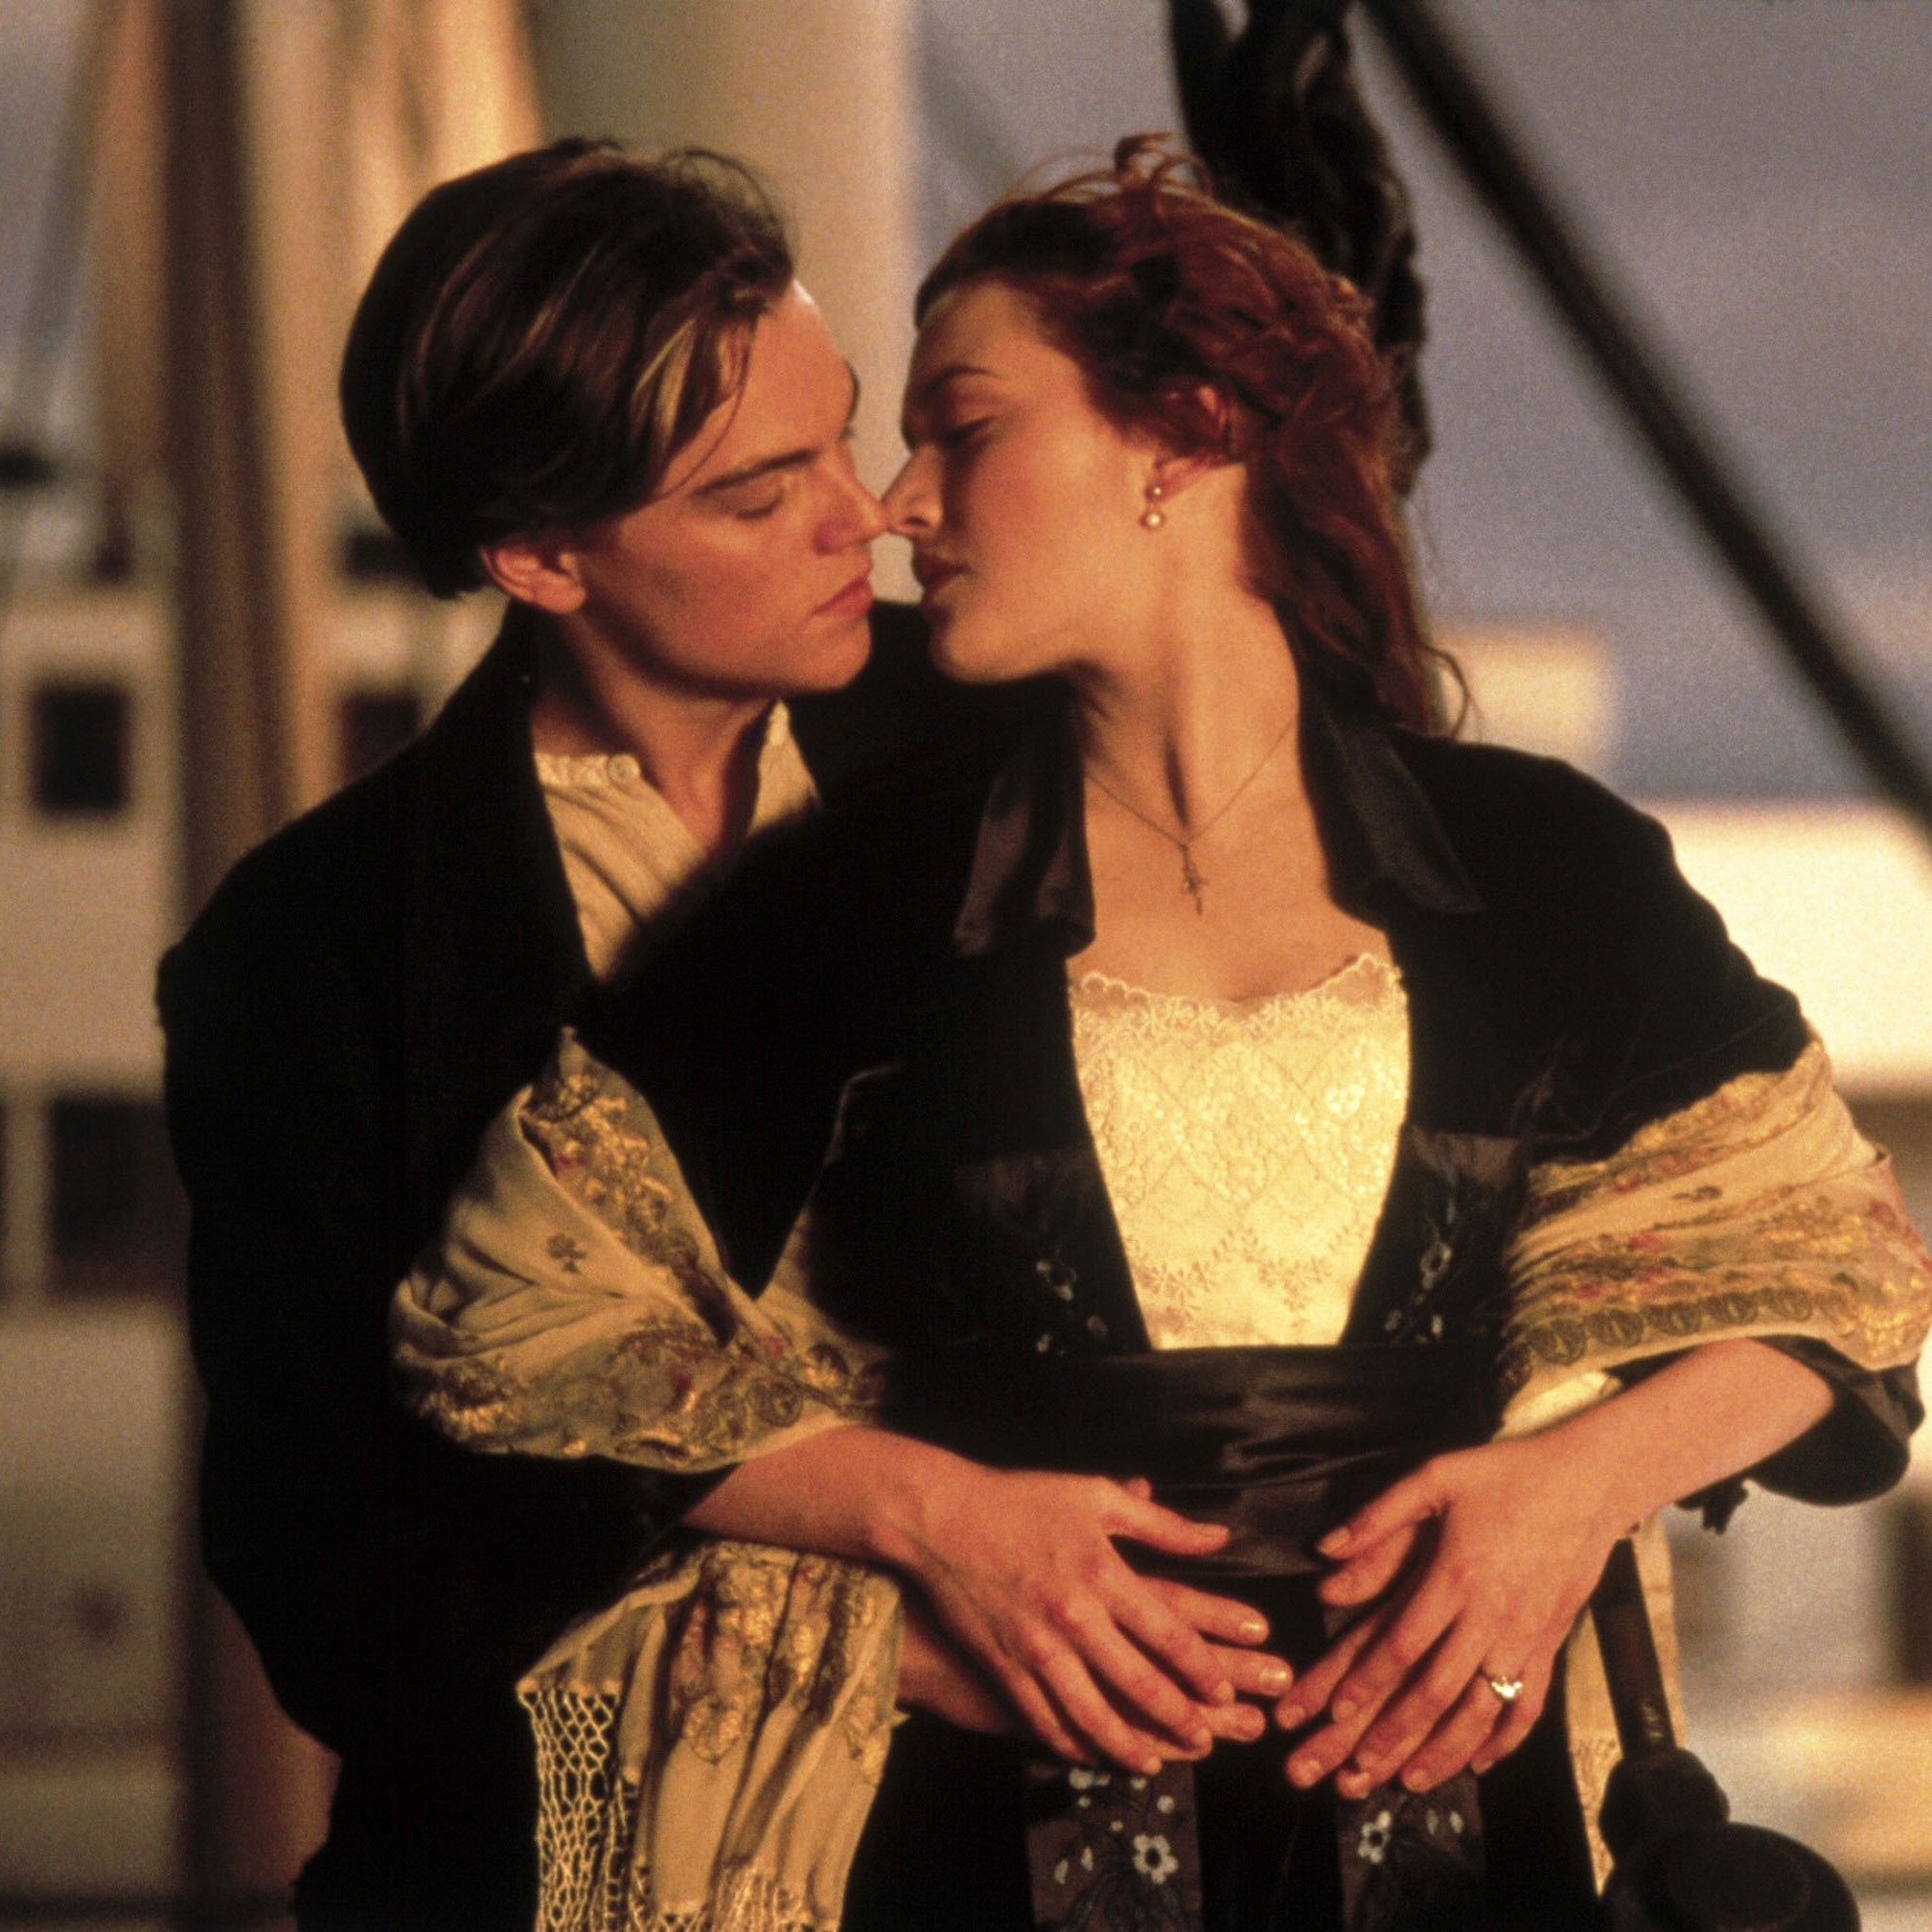 Kate Winslet and Leonardo DiCaprio in Titanic Pictures   POPSUGAR Celebrity